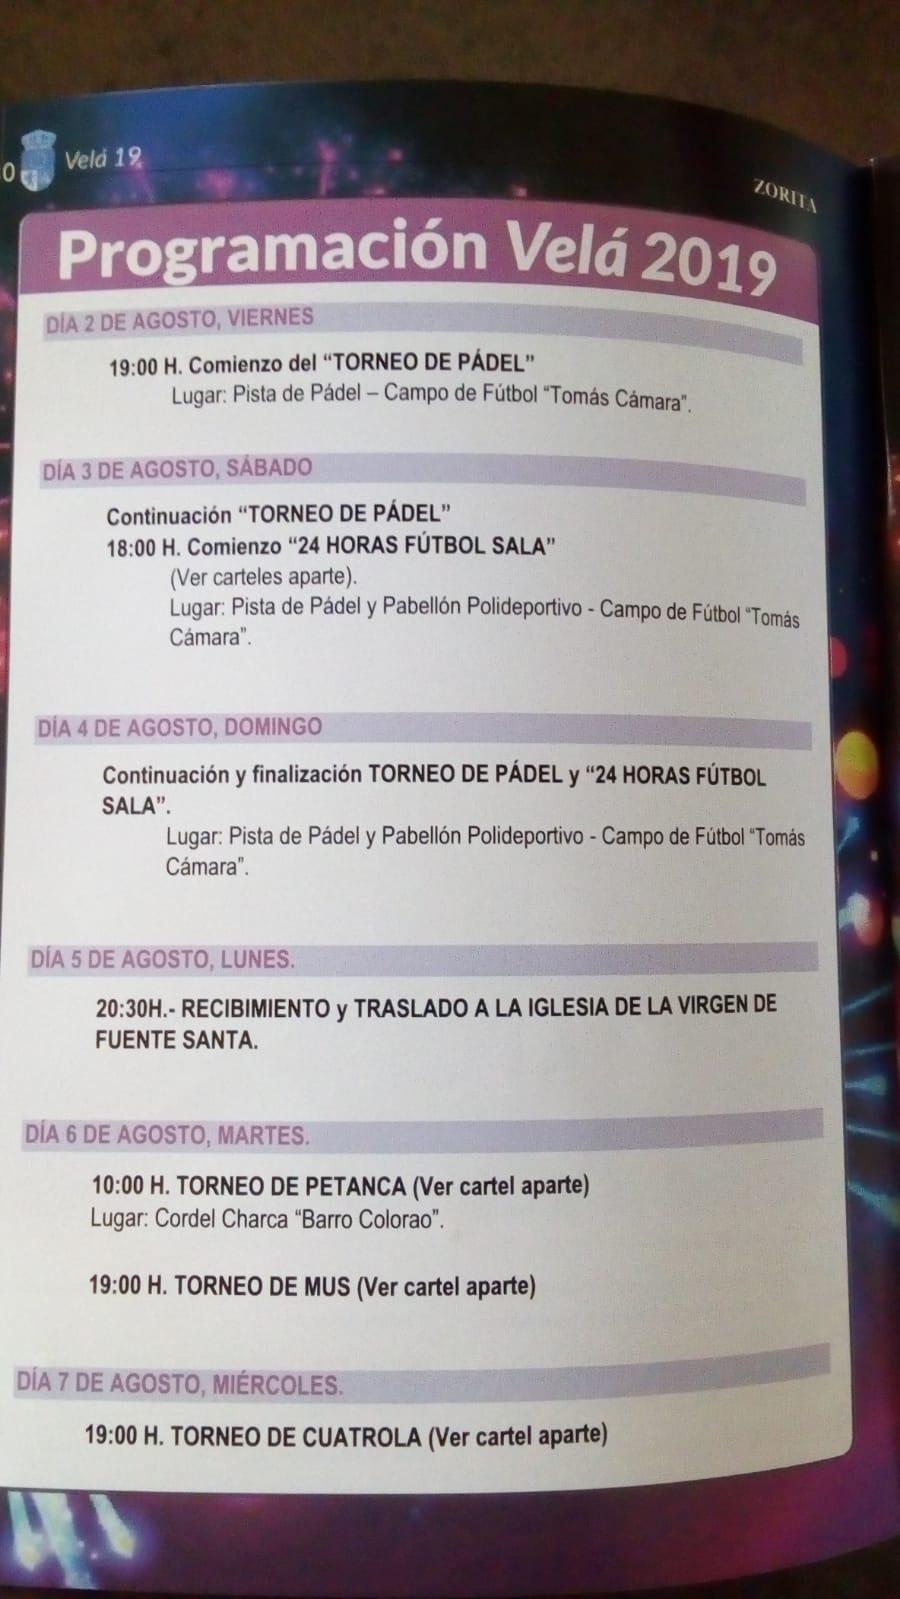 Programa Velá 2019 - Zorita (Cáceres) 1